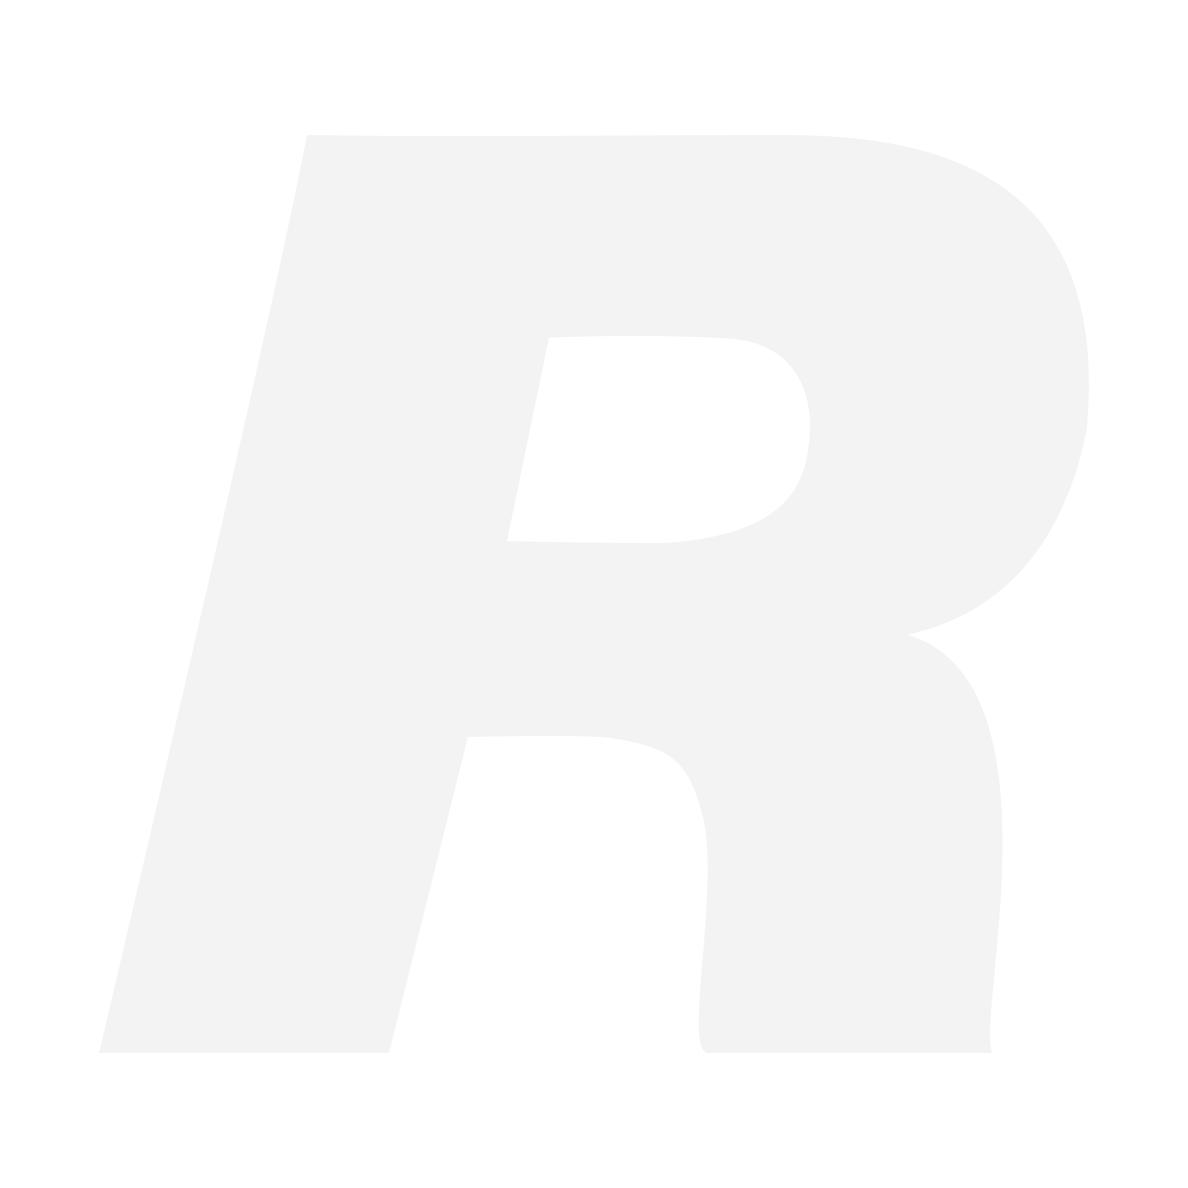 DJI Mavic/Spark RC-kaapeli, USB Type C